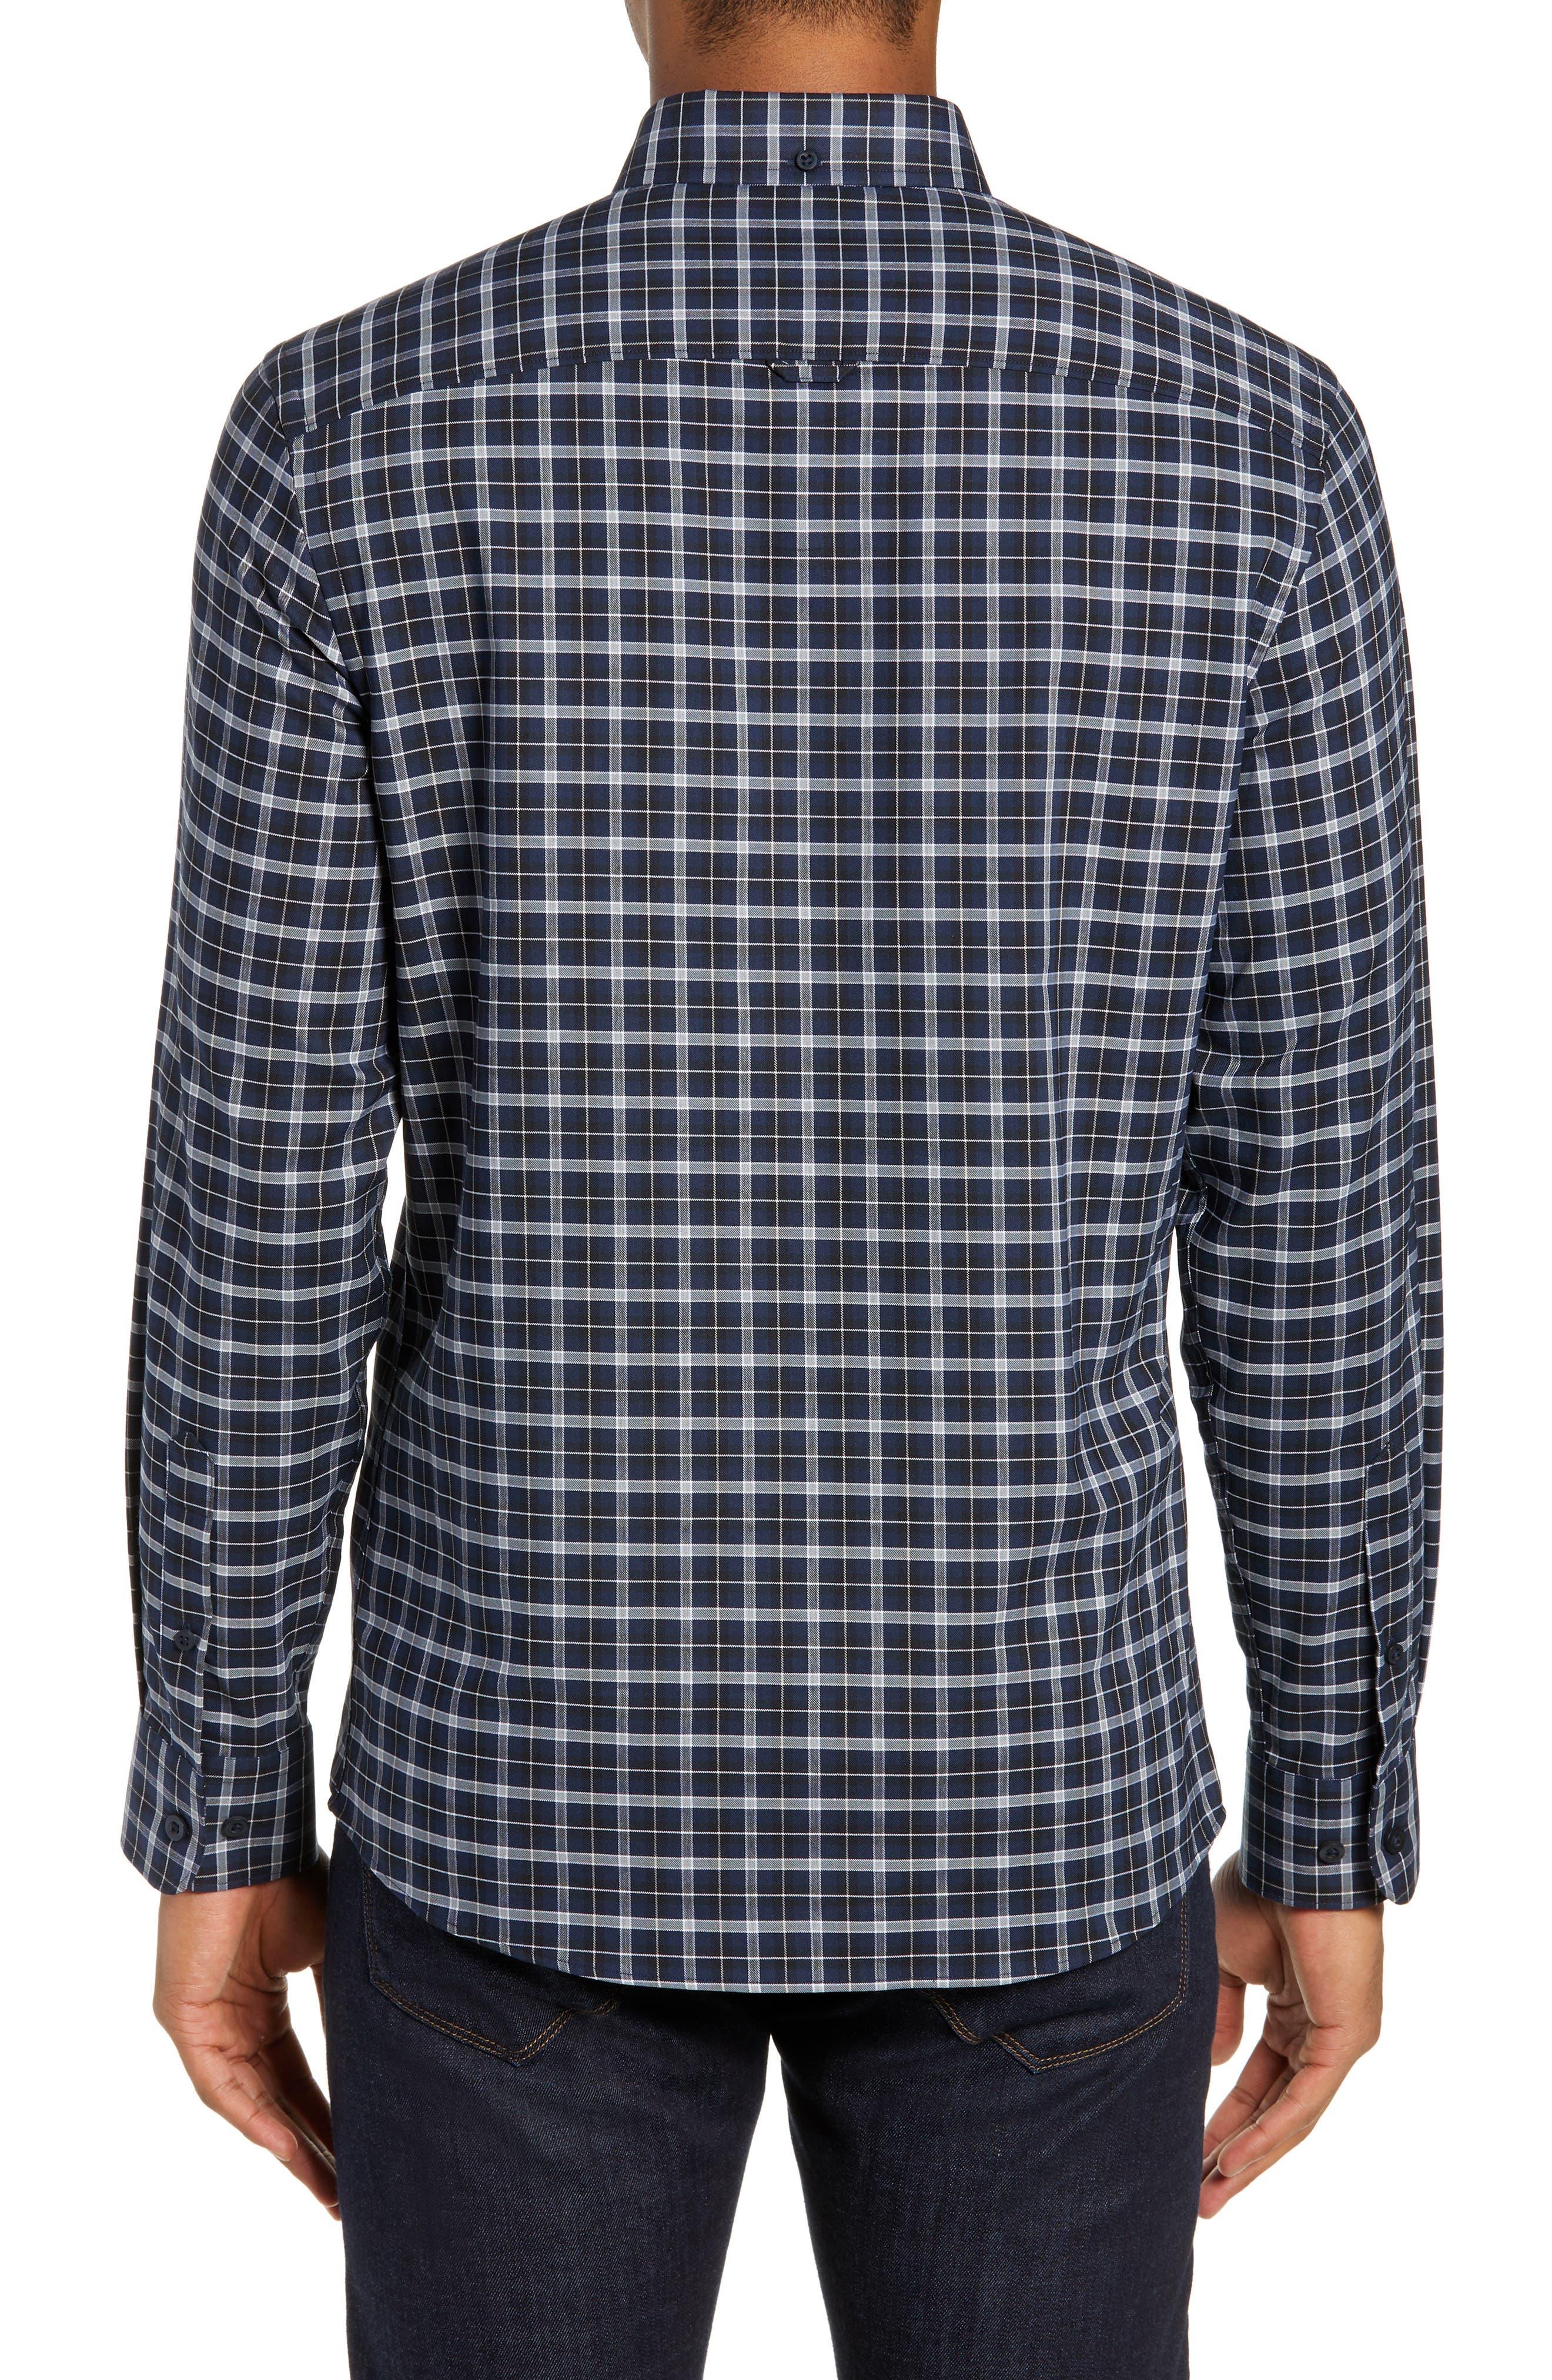 NORDSTROM MEN'S SHOP, Tech-Smart Slim Fit Check Sport Shirt, Alternate thumbnail 3, color, NAVY IRIS BLACK CHECK